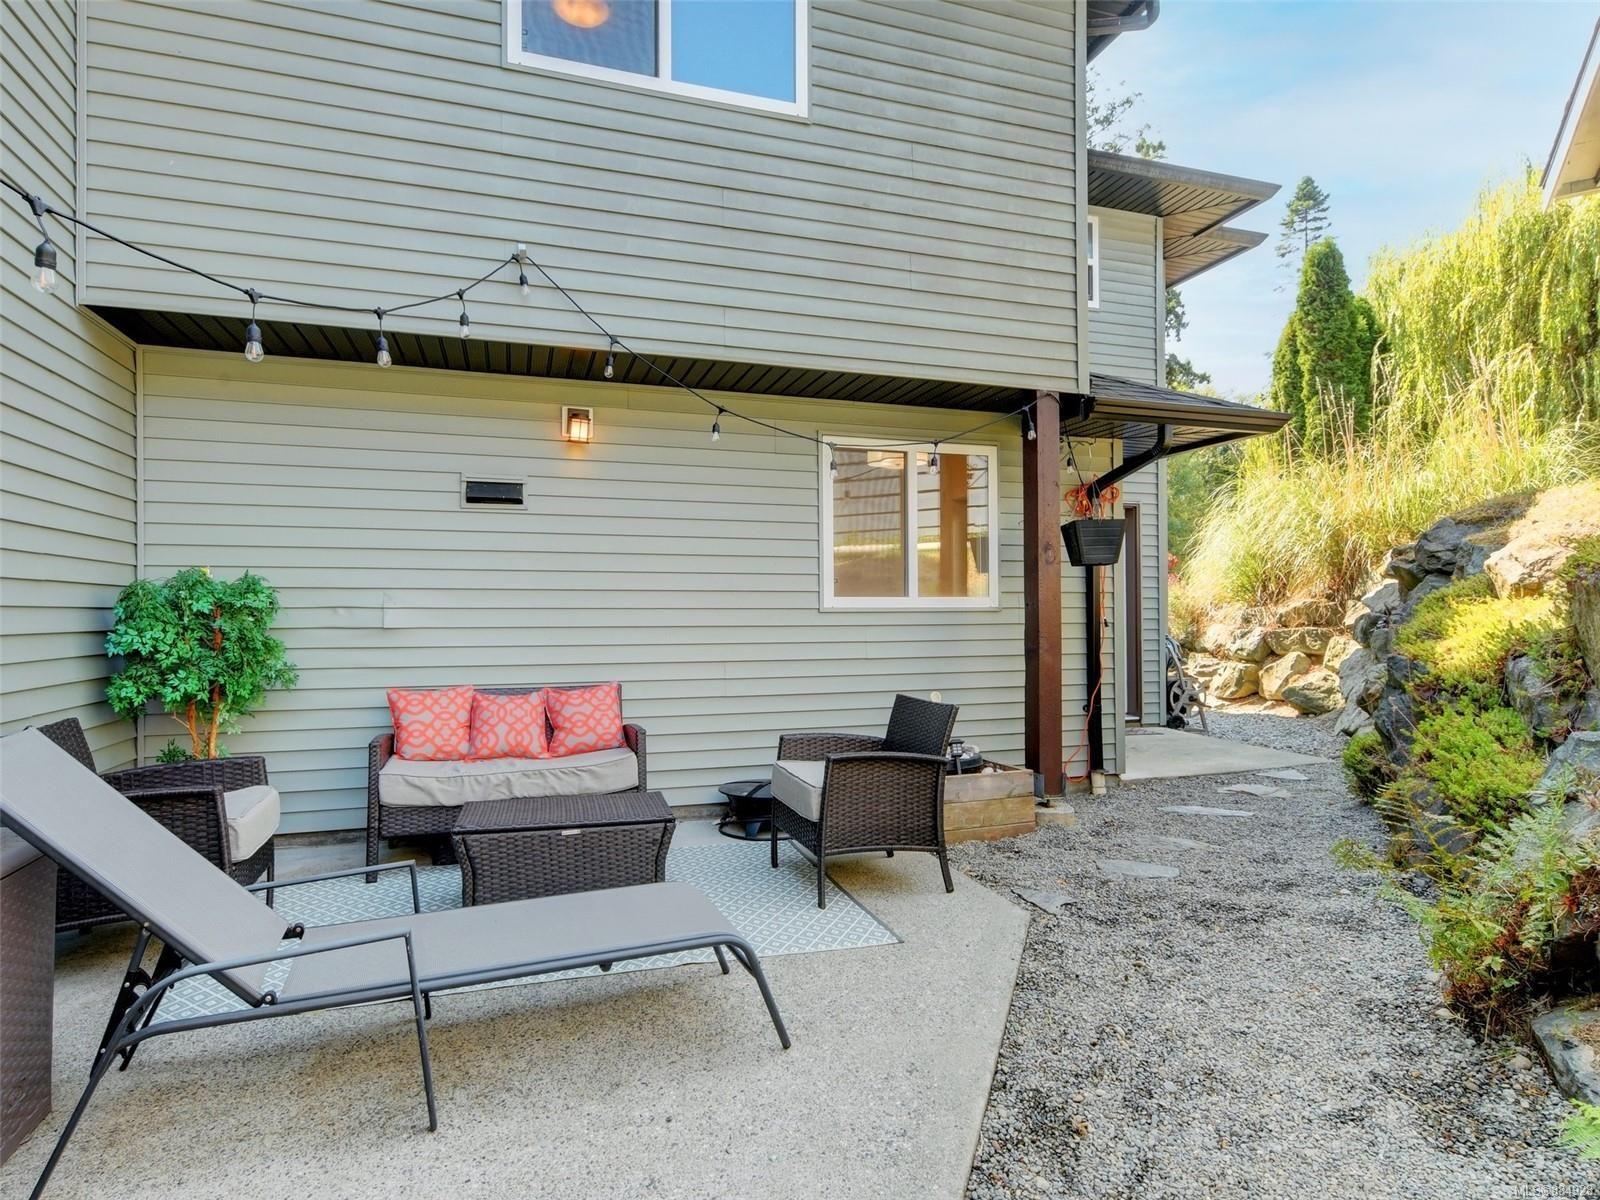 Photo 1: Photos: 6896 Beaton Rd in : Sk Broomhill Half Duplex for sale (Sooke)  : MLS®# 884928